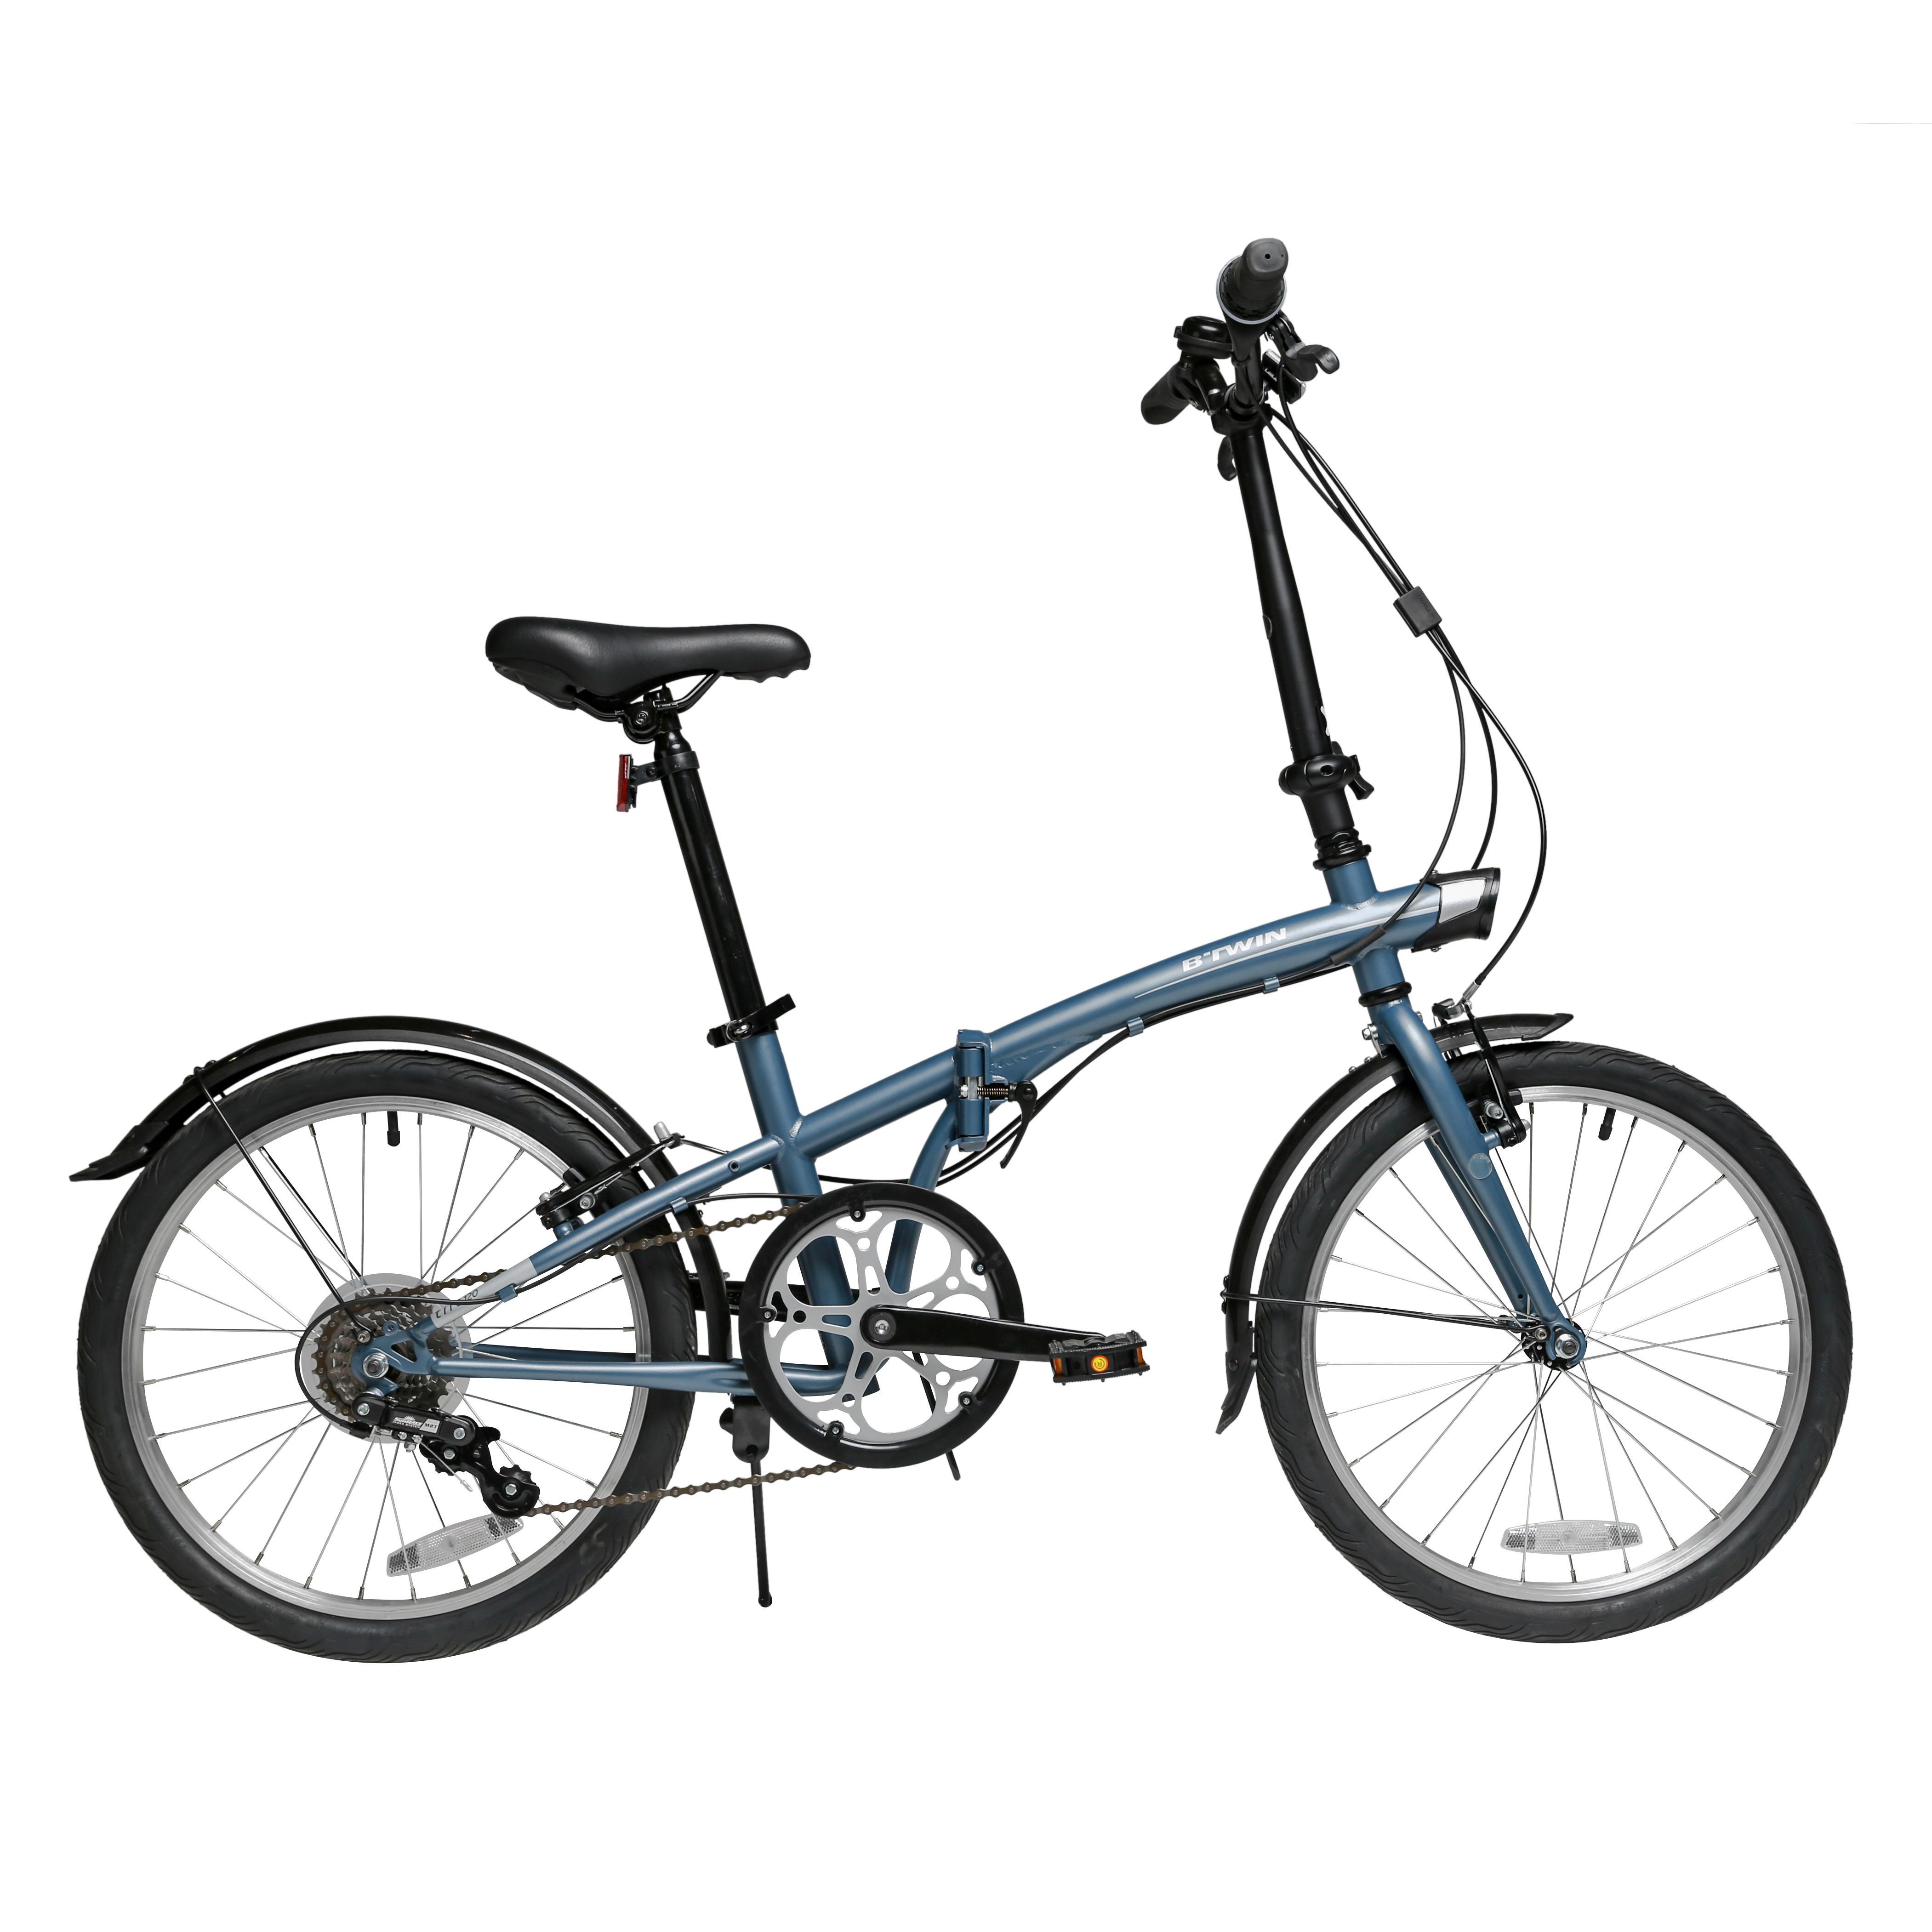 Bicicleta plegable Tilt 120 de 20